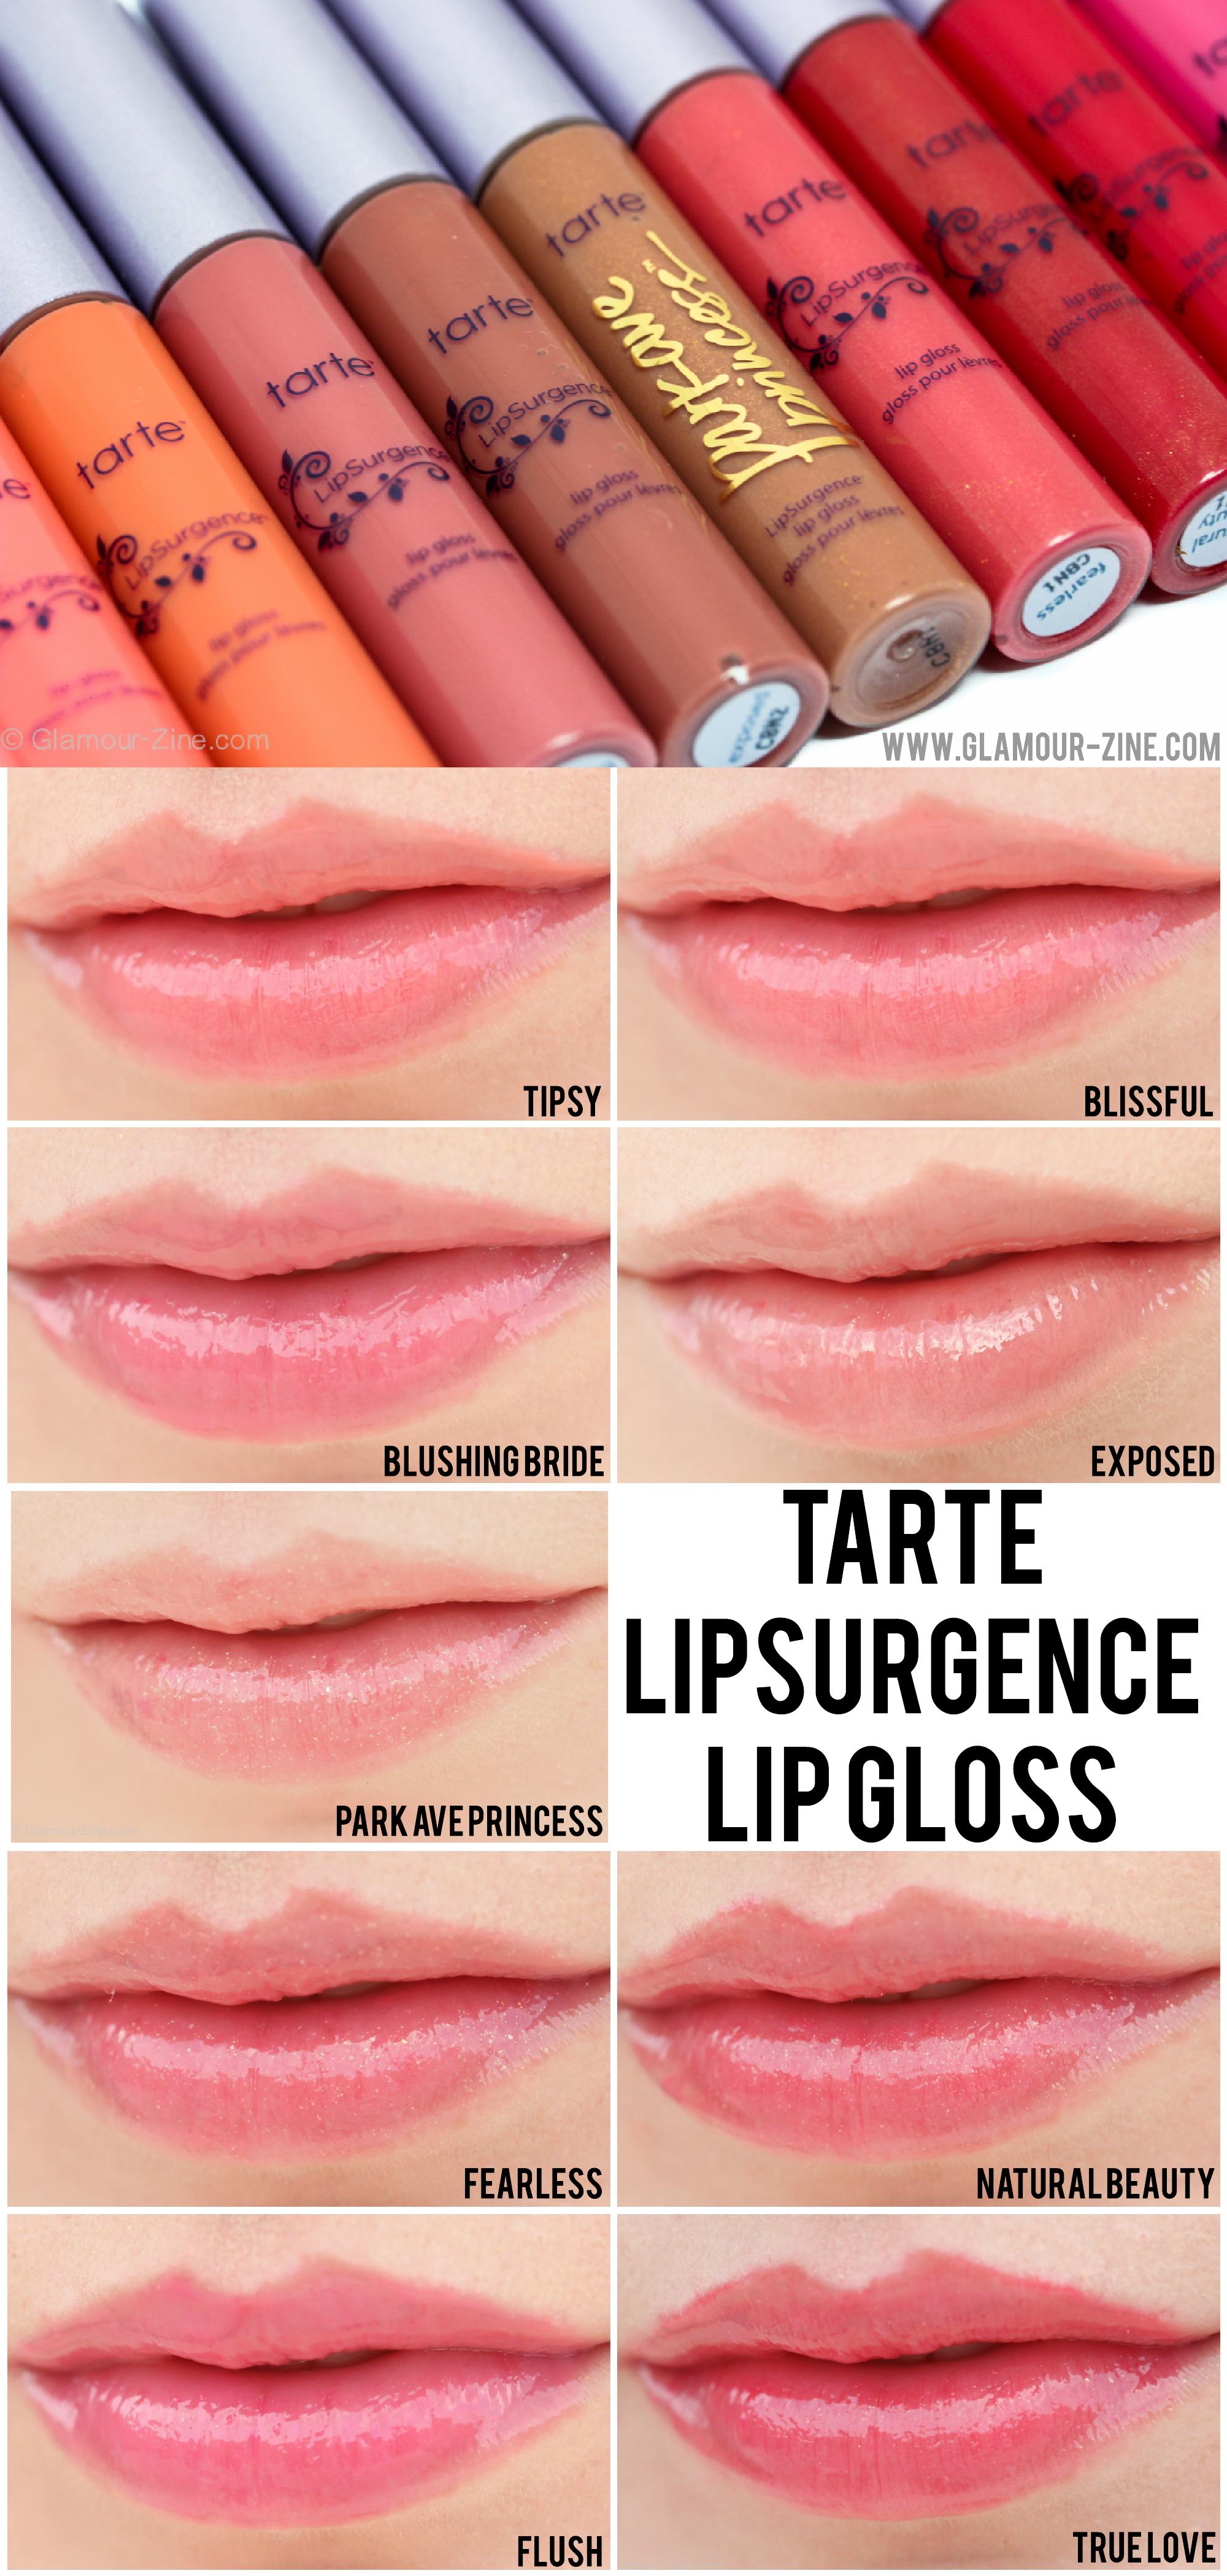 Tarte Creative Marketing Cosmetics Lipsurgence Lip Gloss Review Photos And Swatches Via Holly Richer Zine Tarte Cosmetics Skin Makeup Makeup Swatches